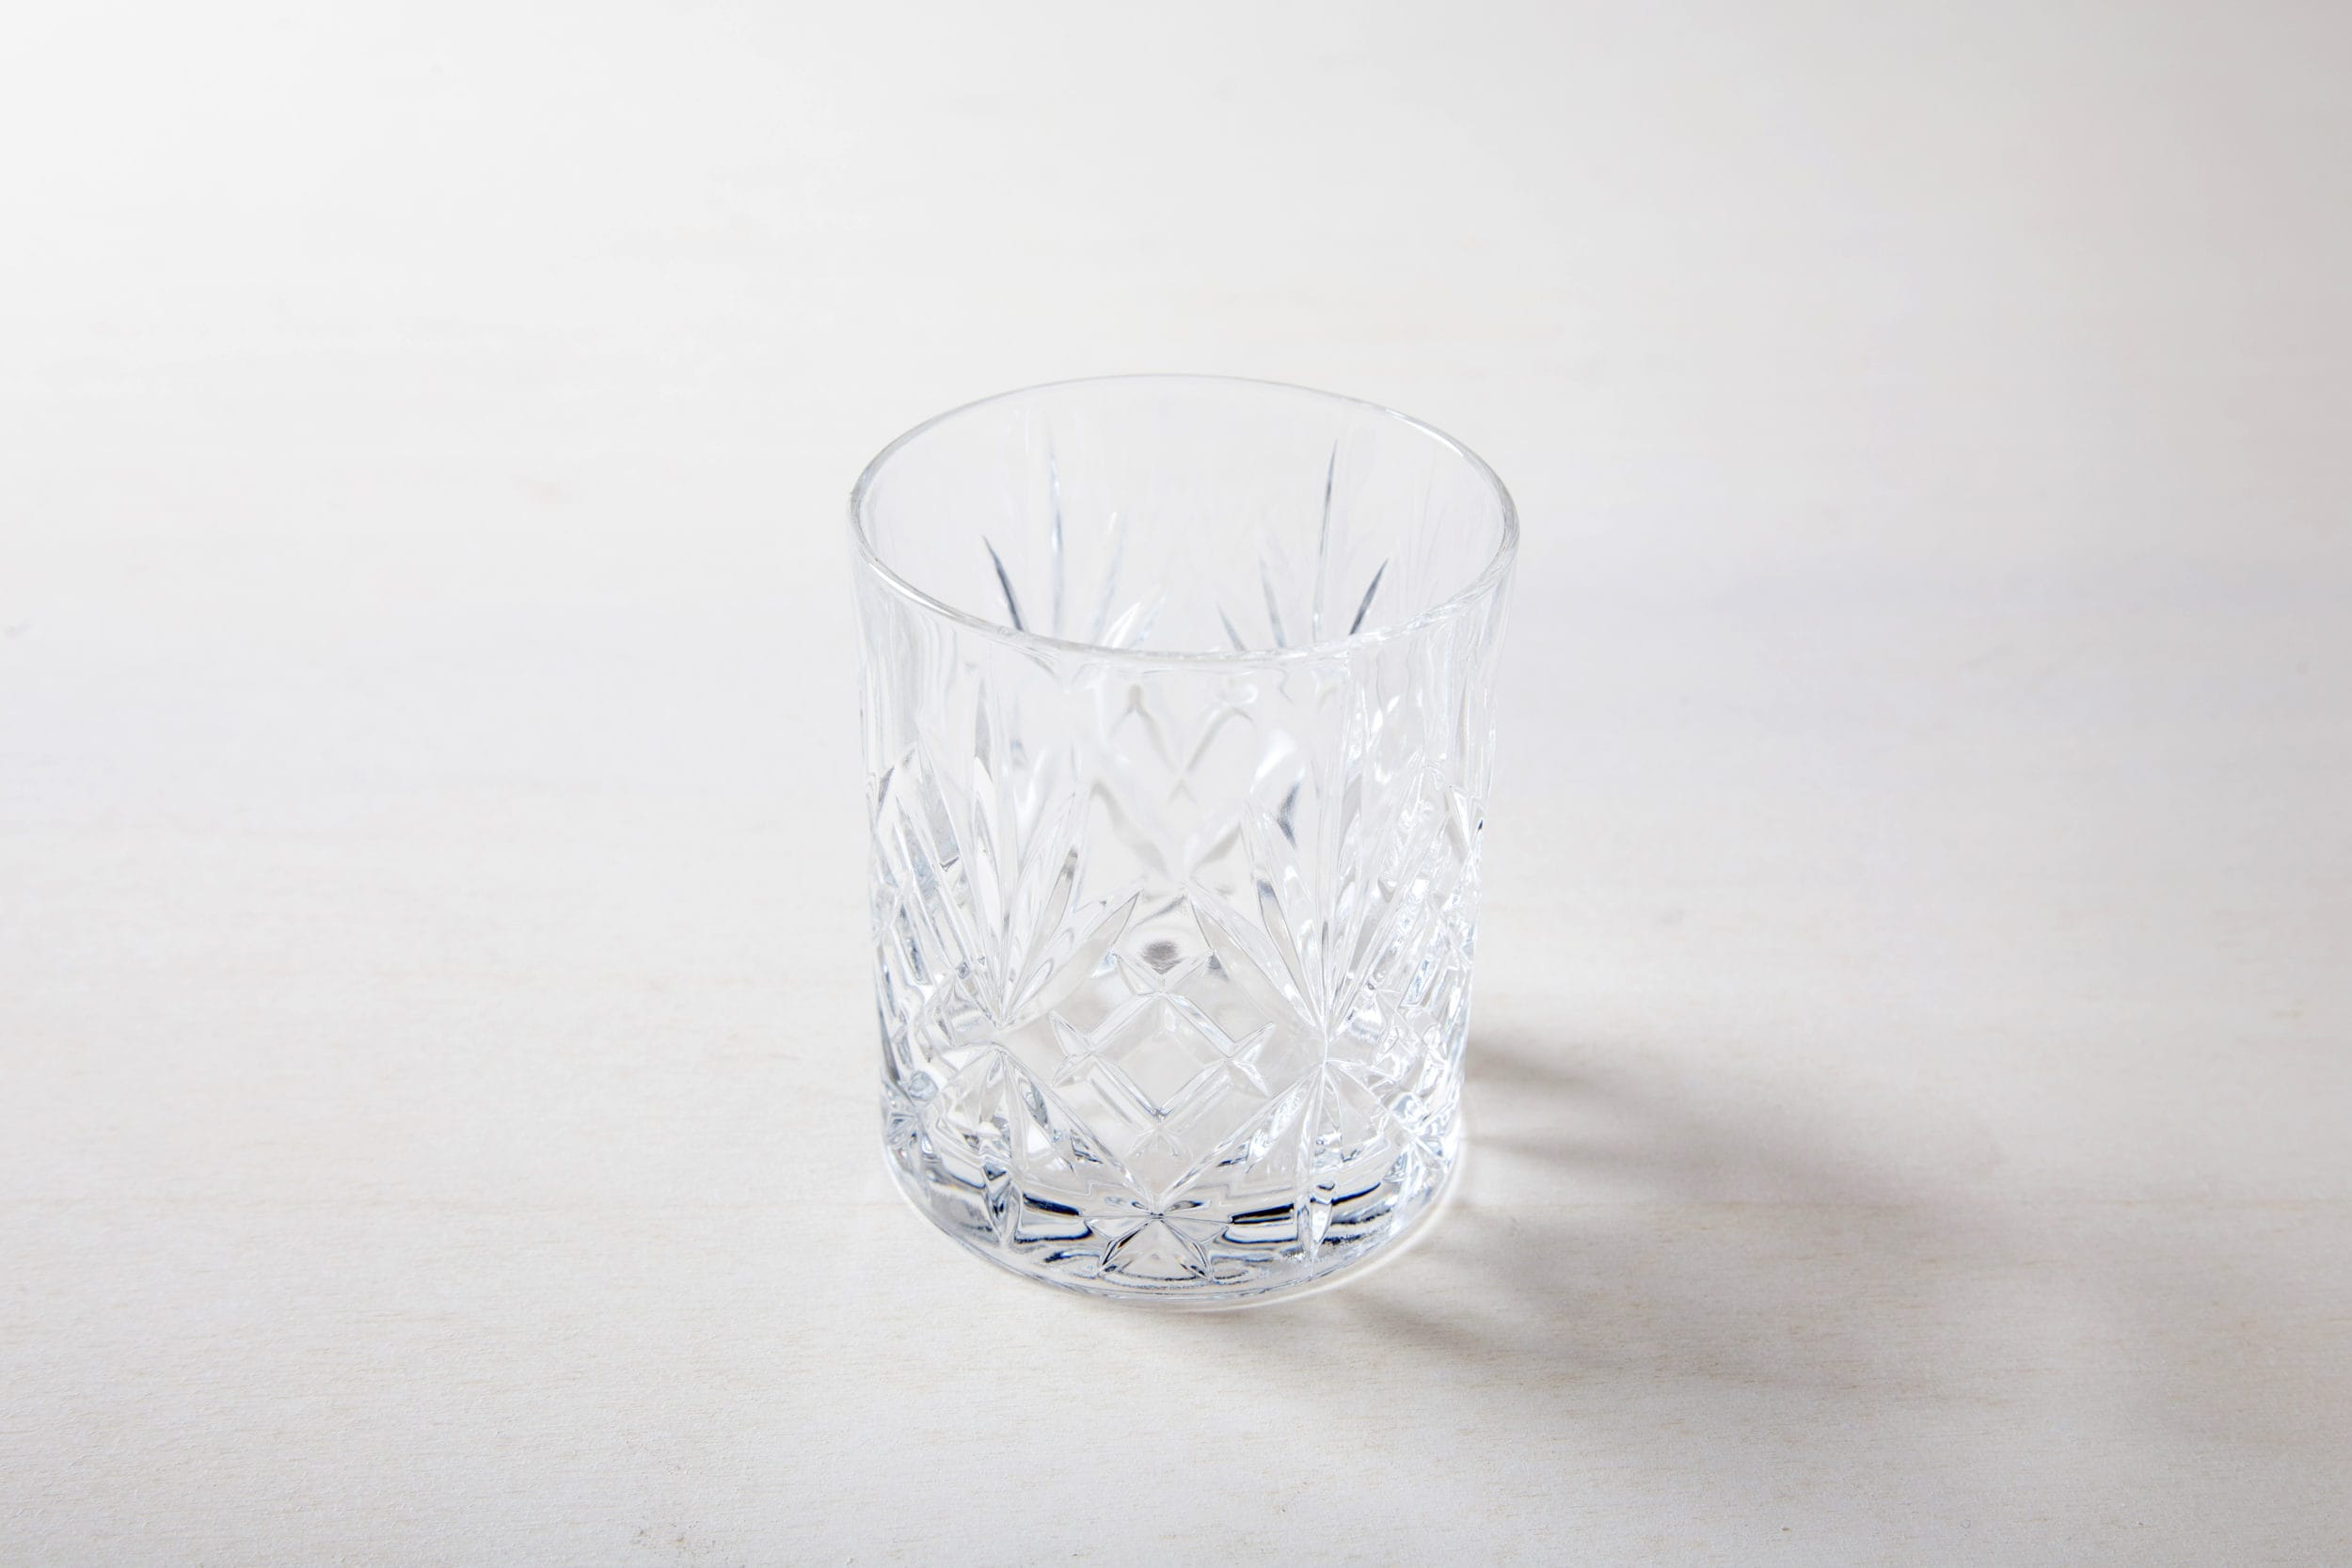 Wasserglas im Retrostil mieten, Old Fashioned Glas, Lowball